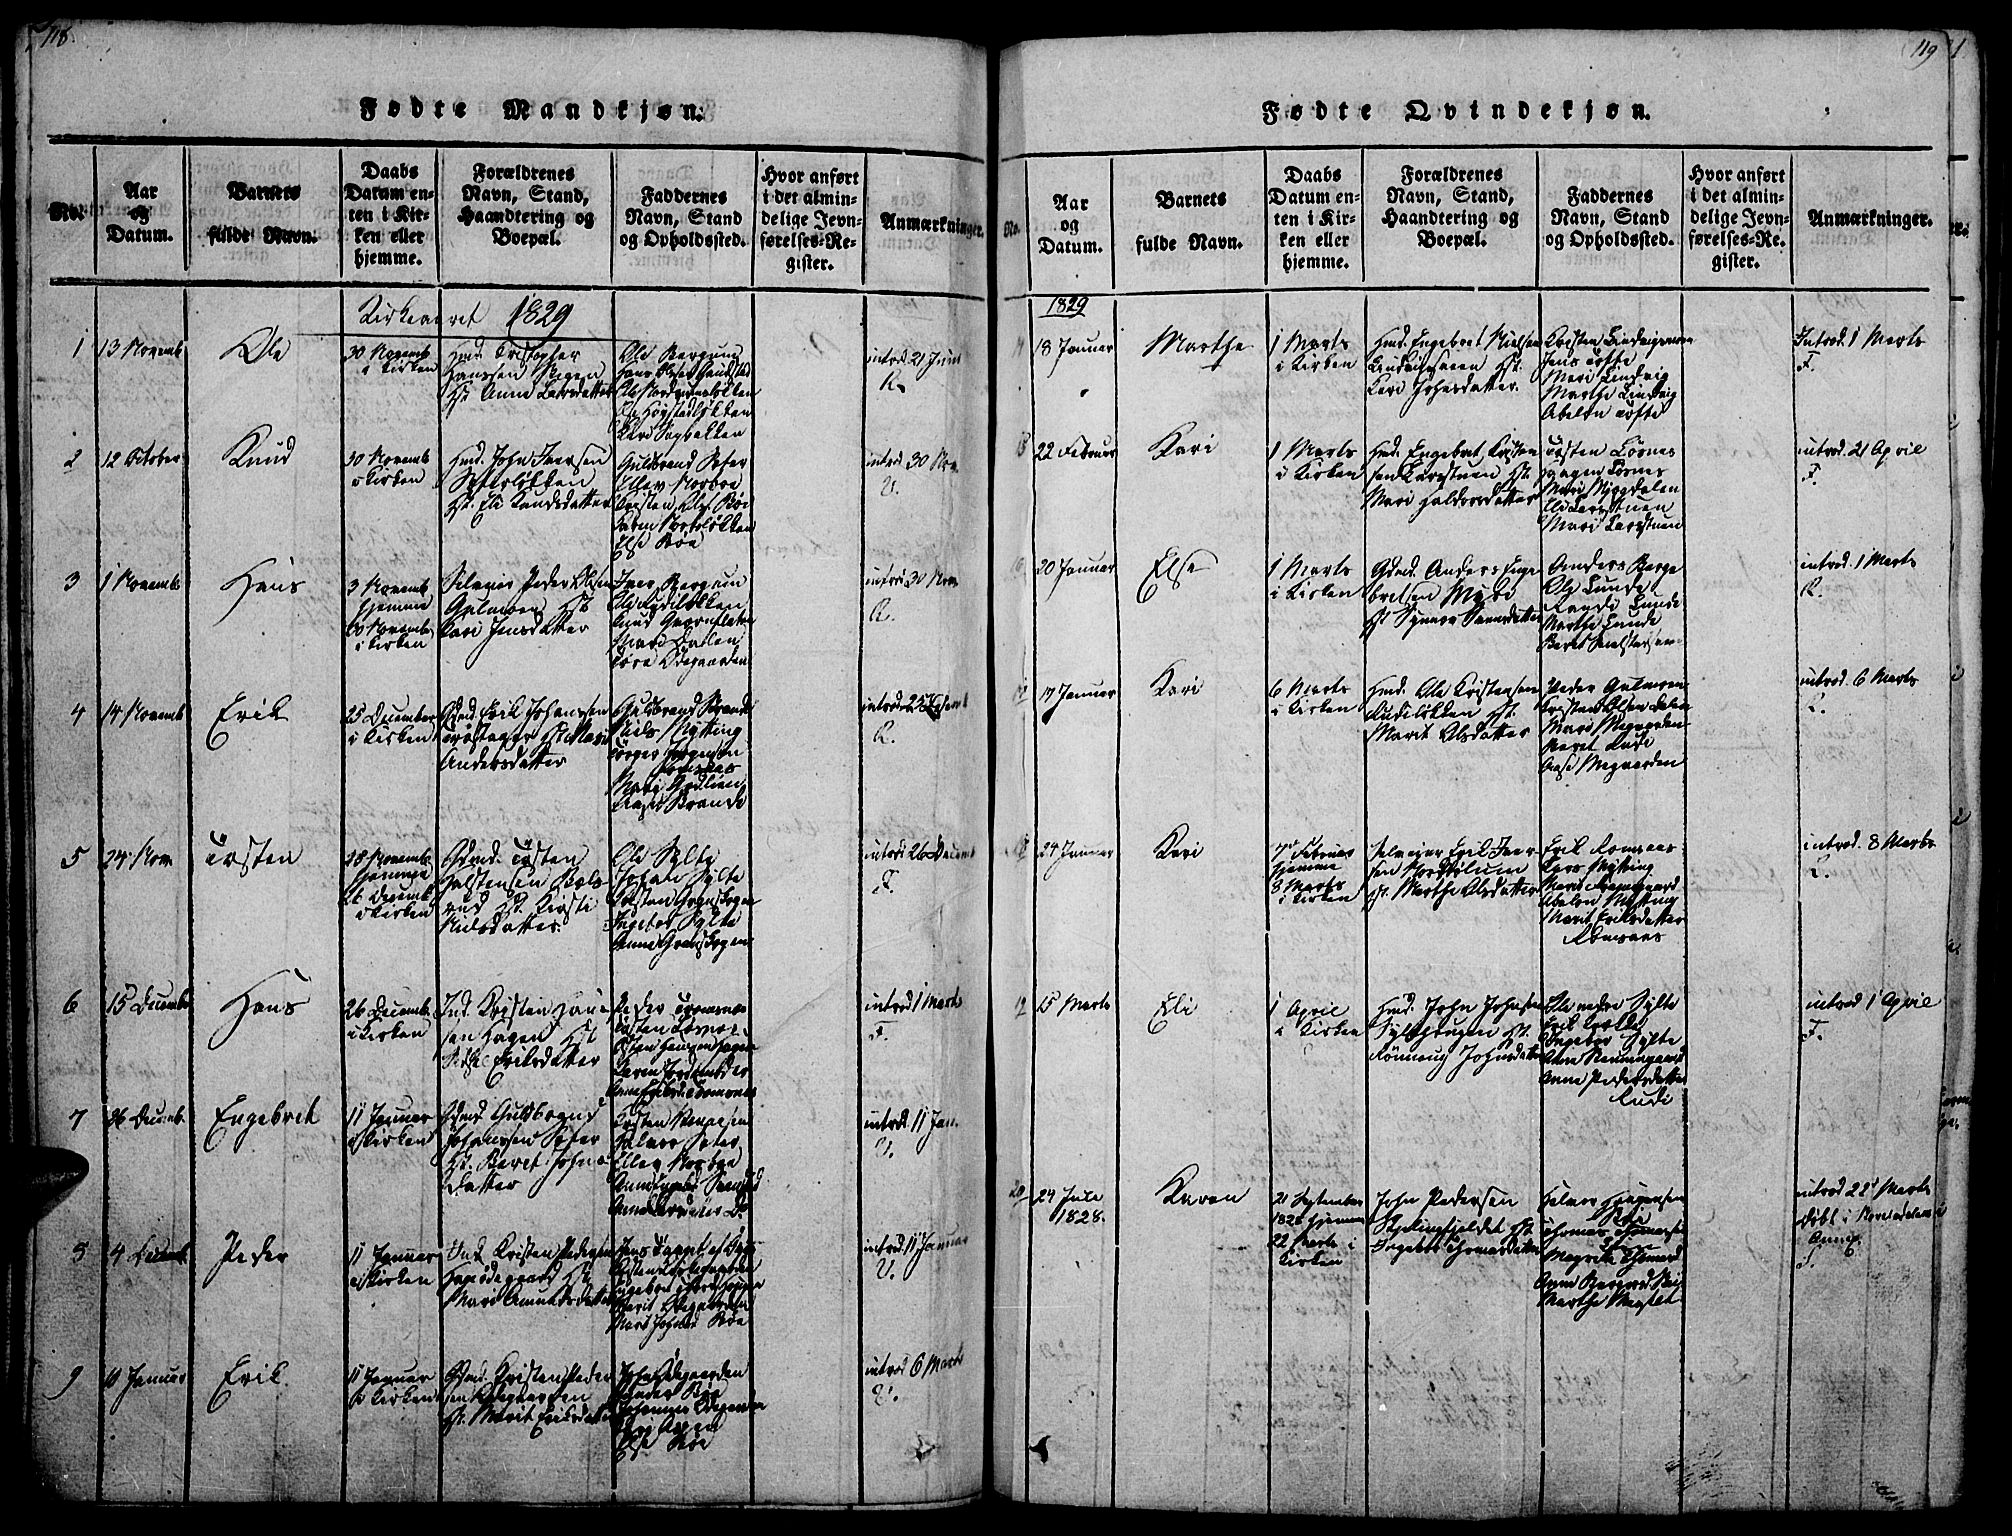 SAH, Ringebu prestekontor, Ministerialbok nr. 4, 1821-1839, s. 118-119